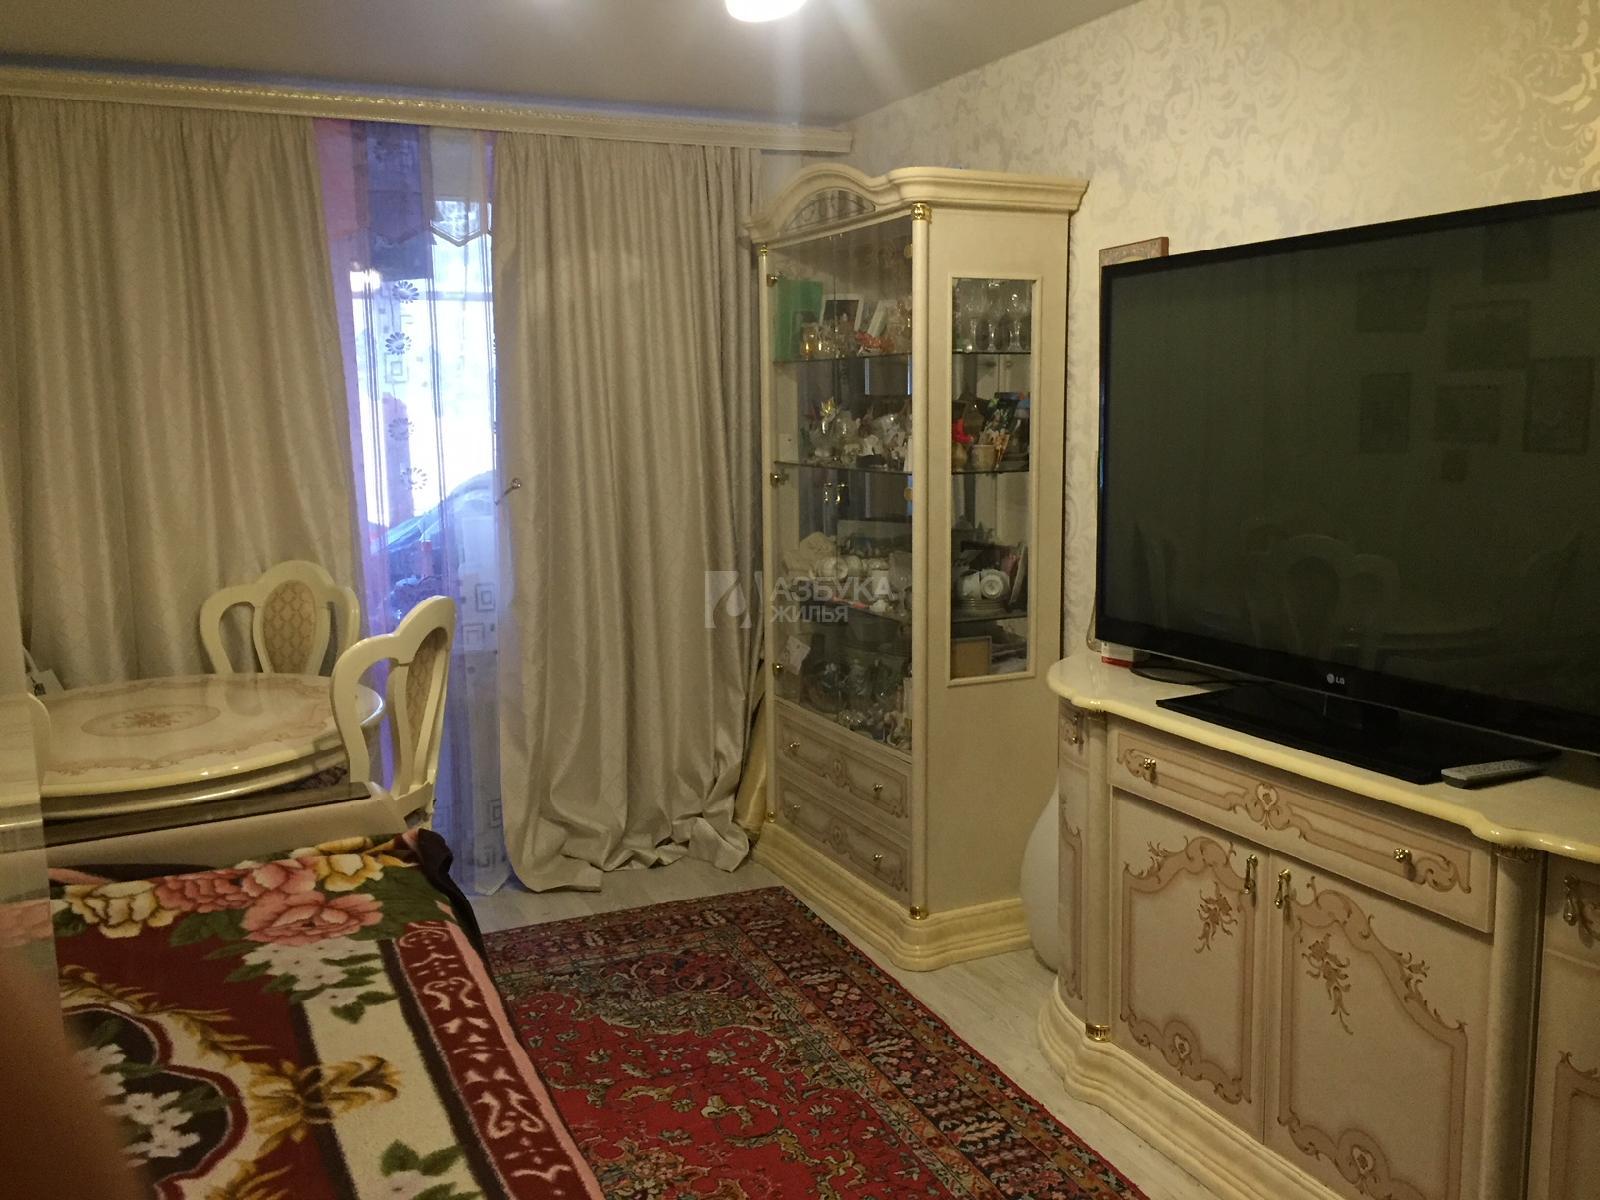 Фото №1 - 3-комнатная квартира, Москва, Криворожская улица 15, метро Нагорная